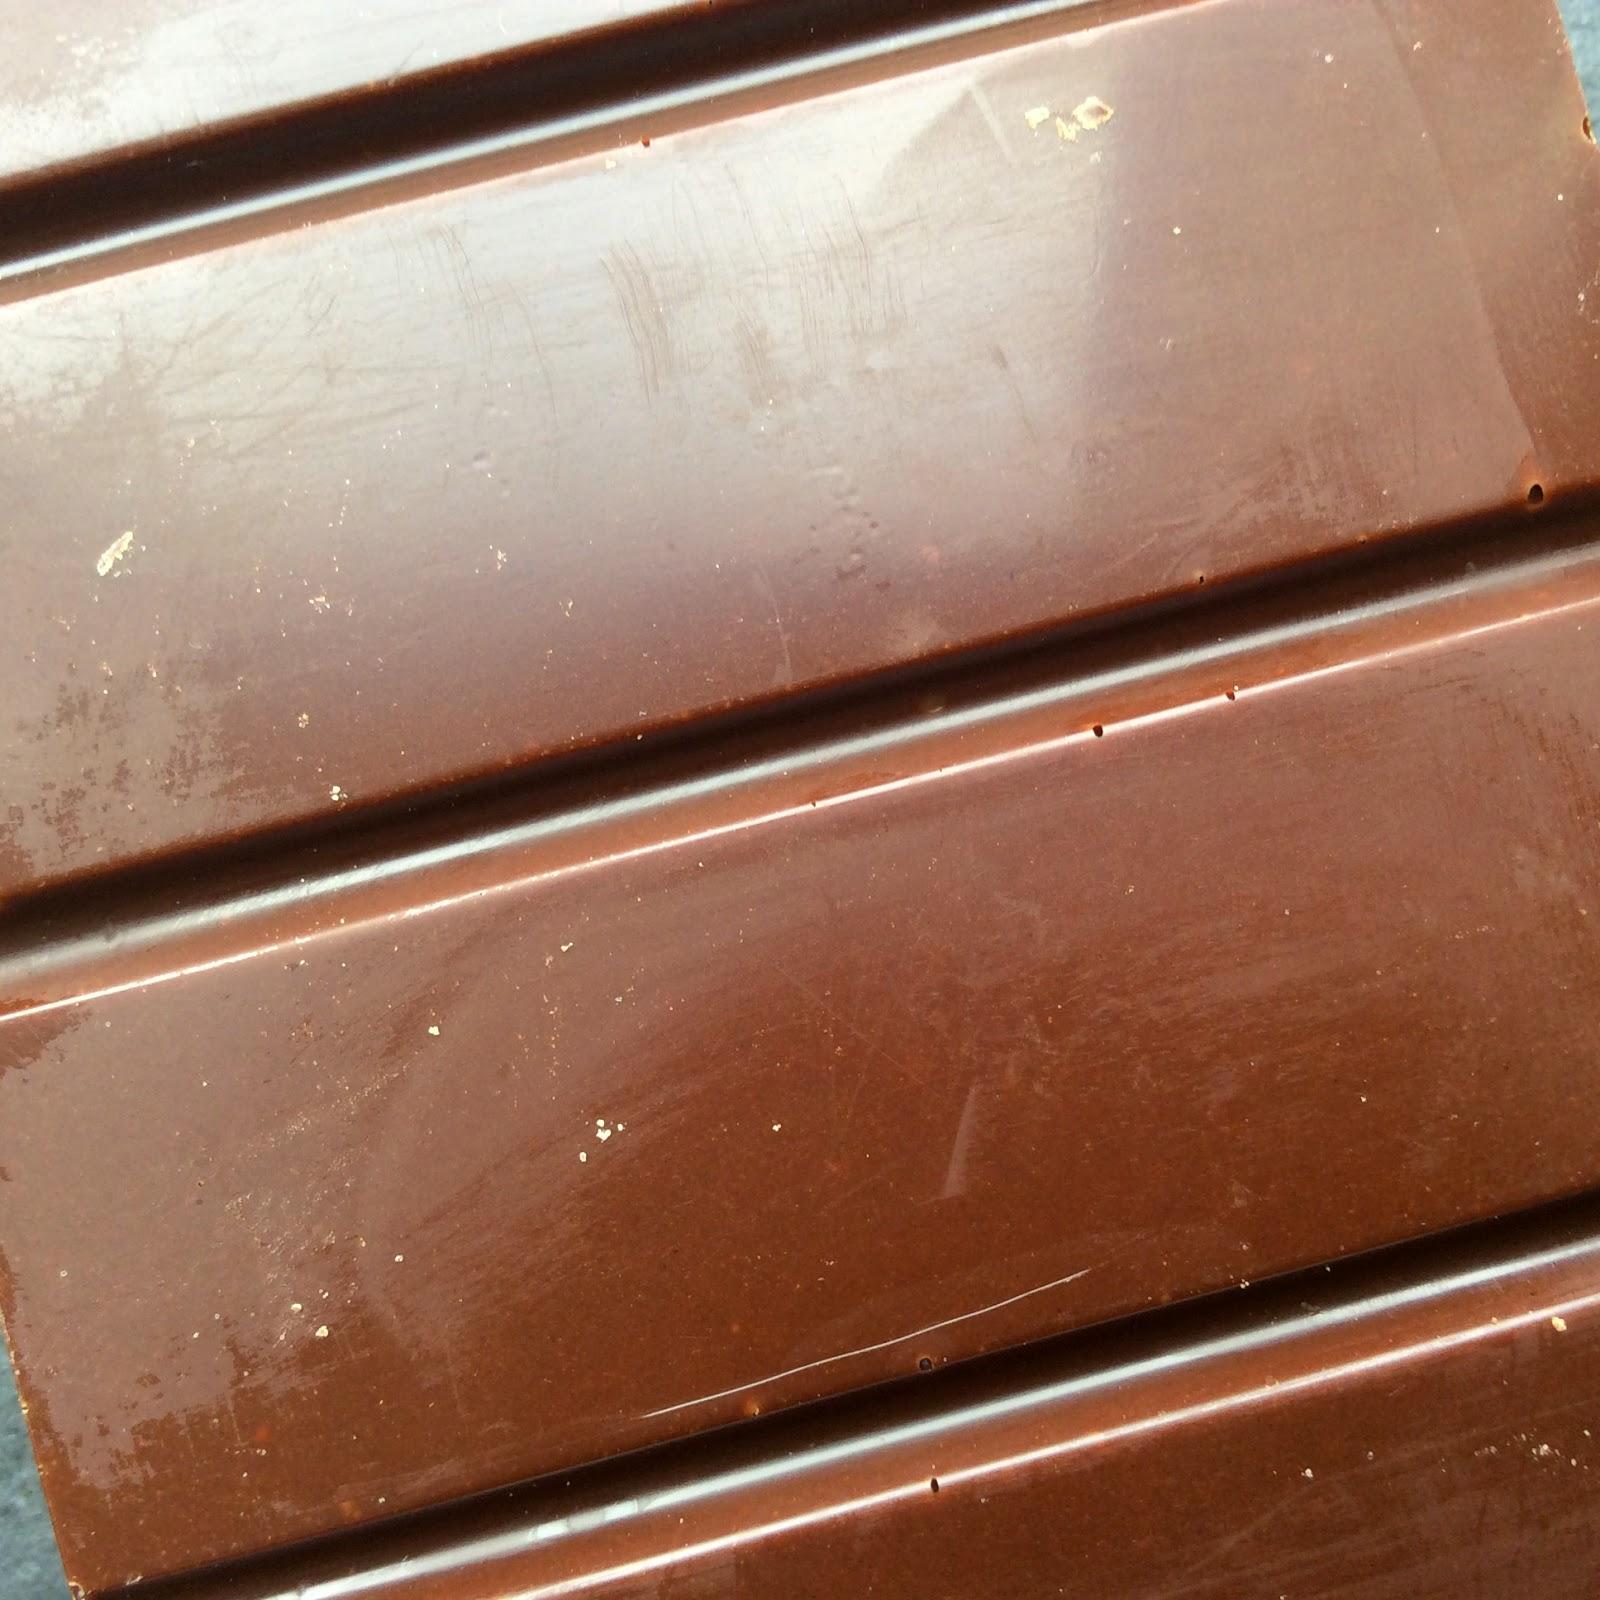 http://chocchick.blogspot.co.uk/2015/03/sea-salted-caramel-bar-paul-young.html